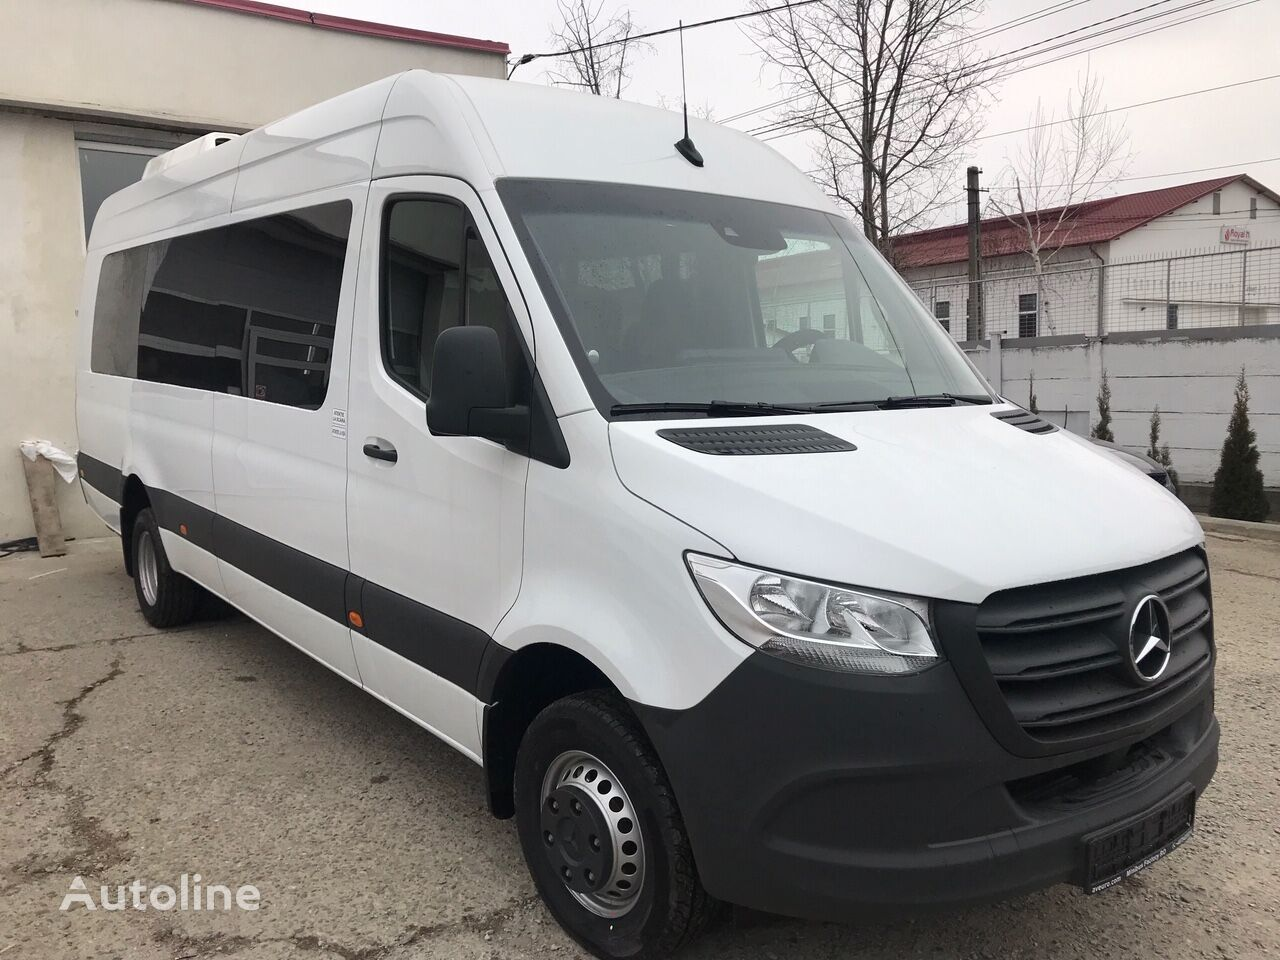 MERCEDES-BENZ Sprinter 516 furgoneta de pasajeros nueva